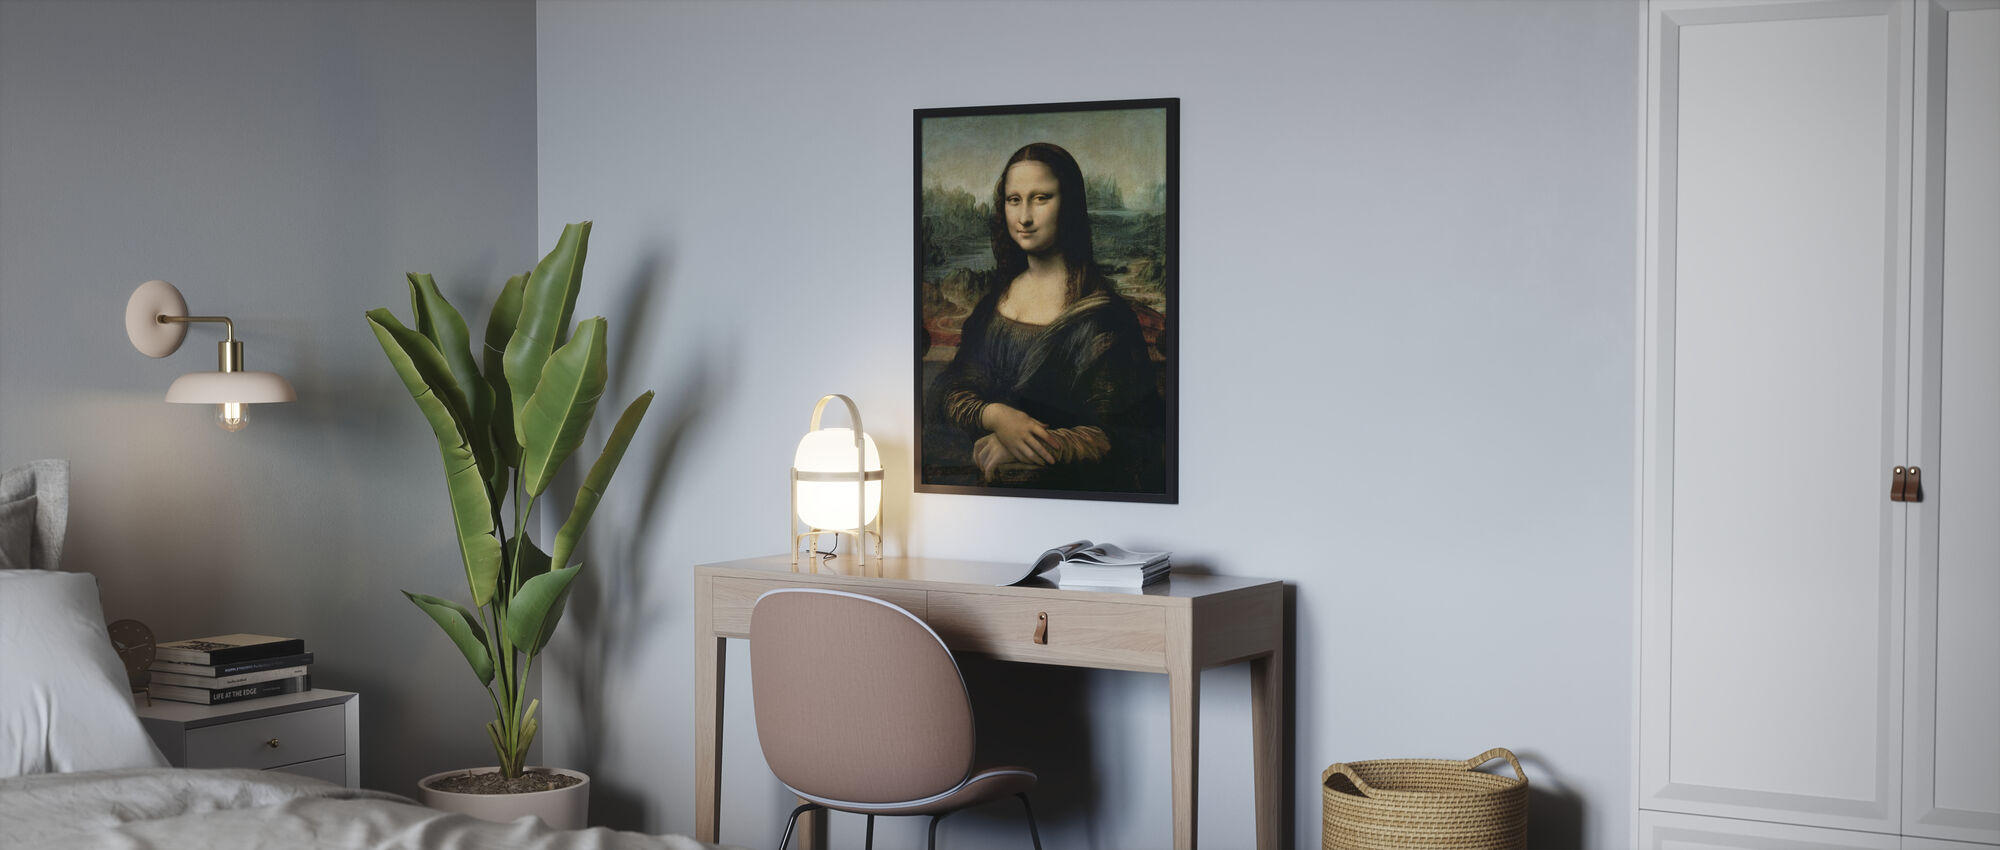 Mona Lisa, Leonardo da Vinci - Poster - Bedroom